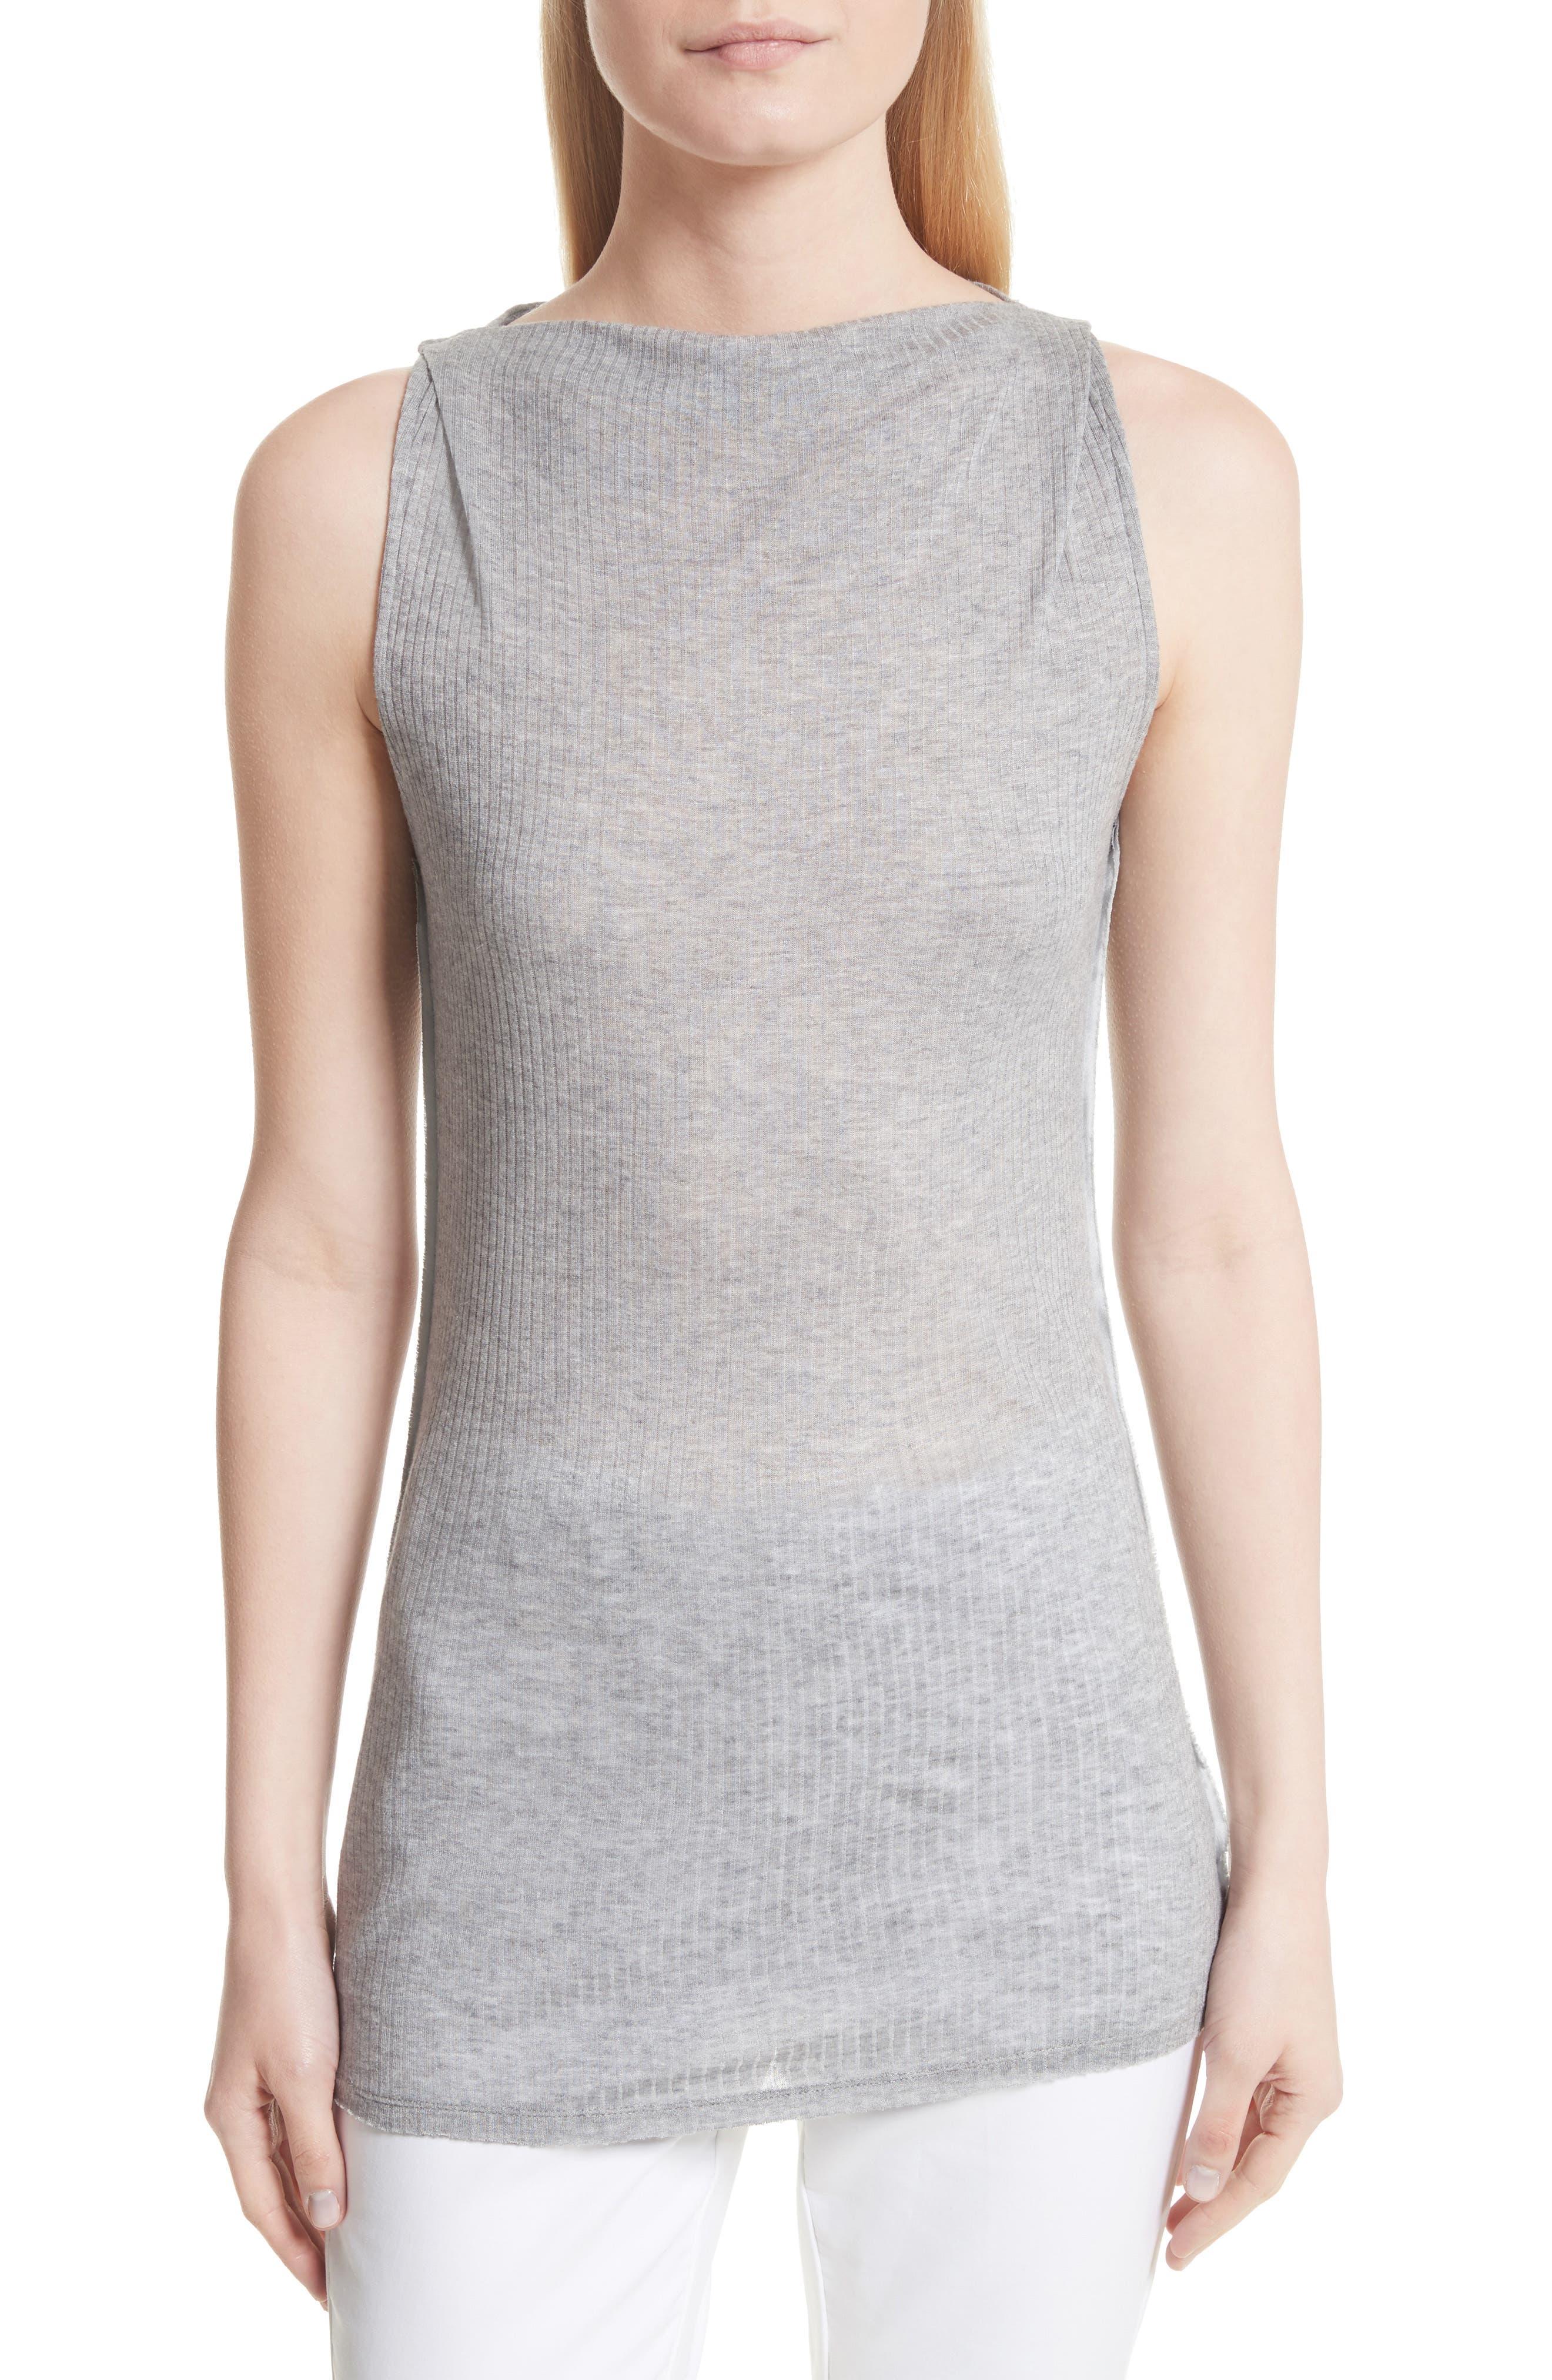 Main Image - rag & bone Madison Sleeveless Top